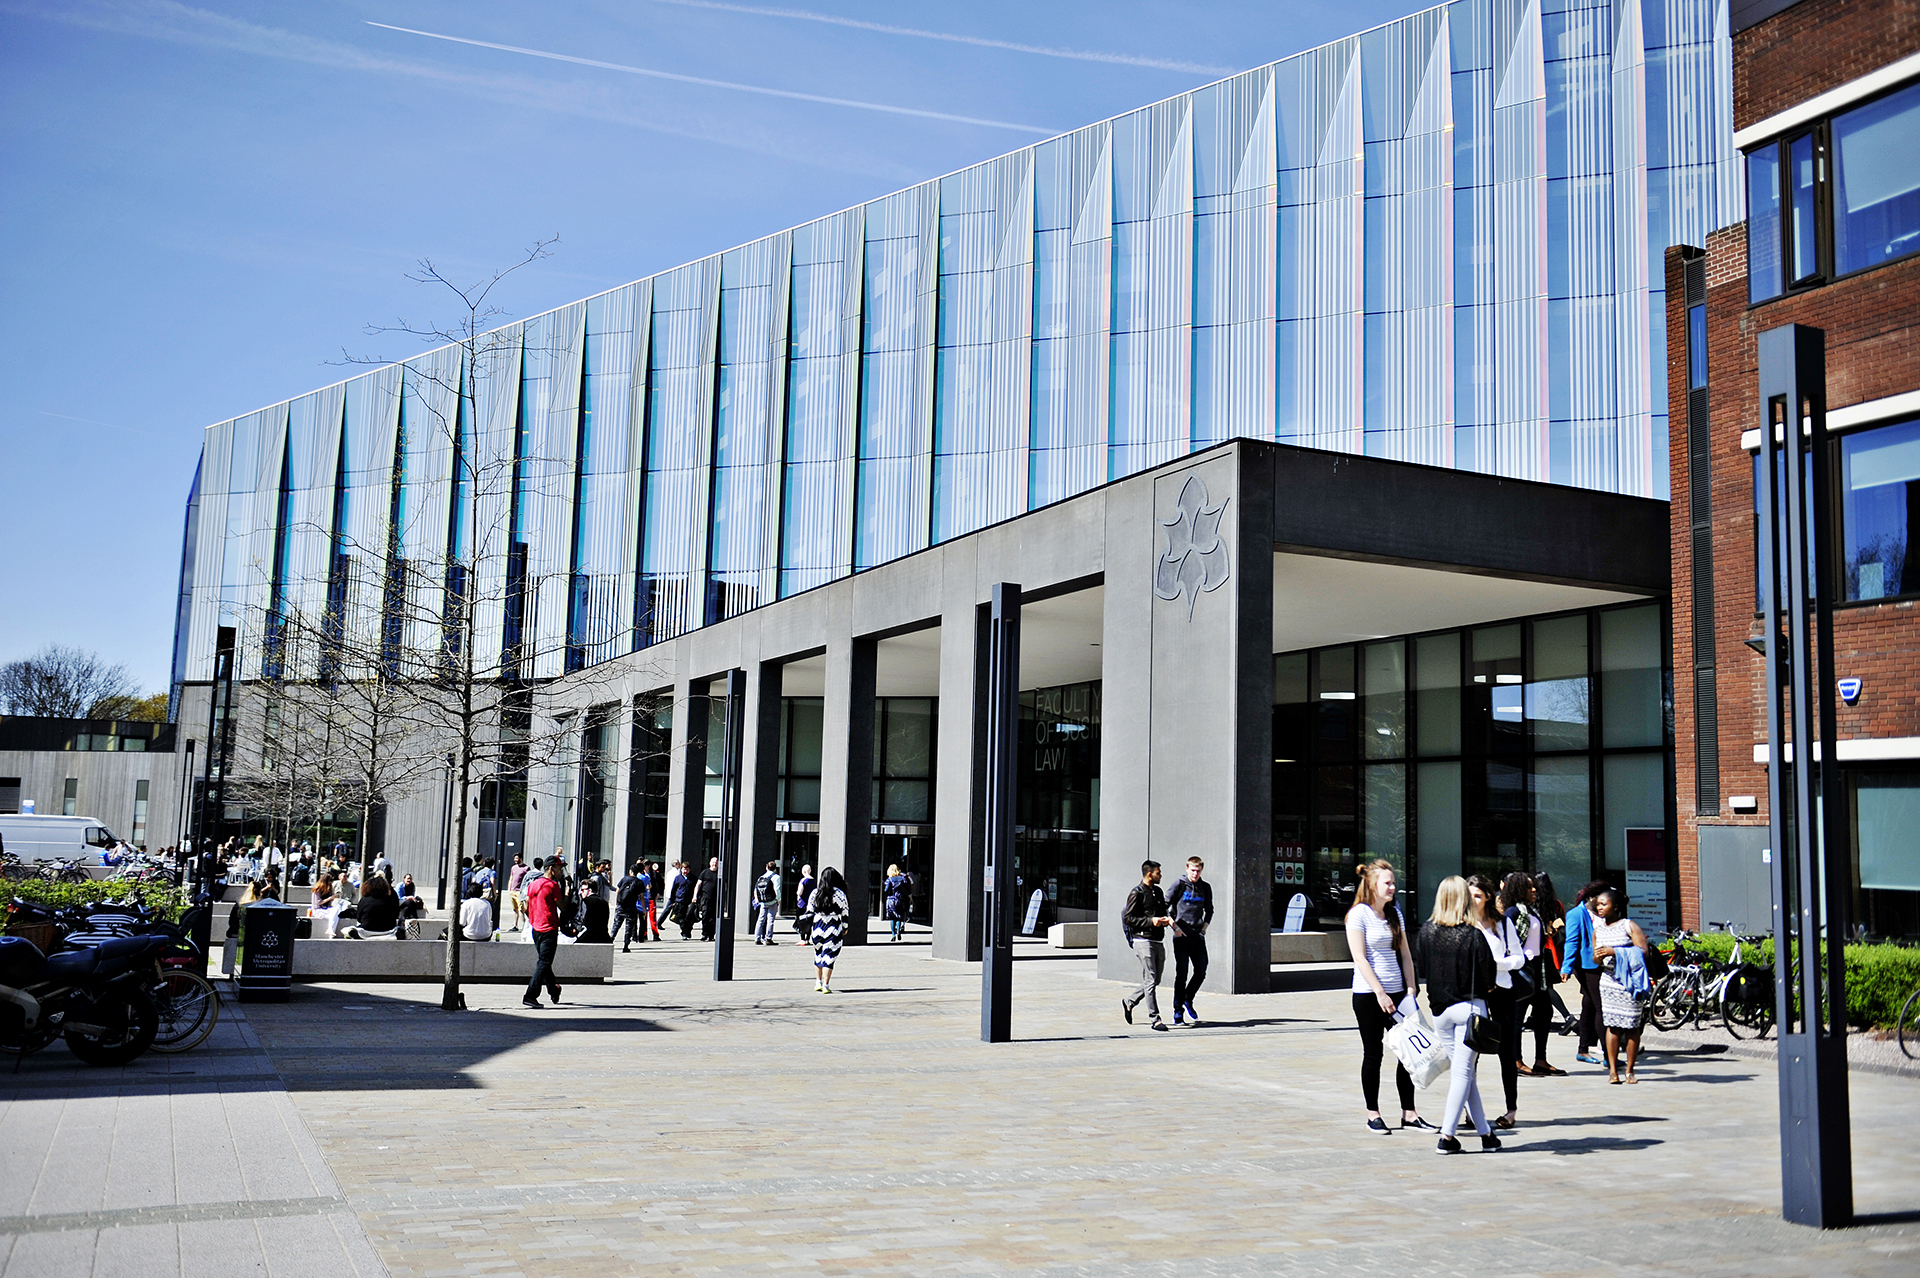 Outside Manchester Metropolitan University